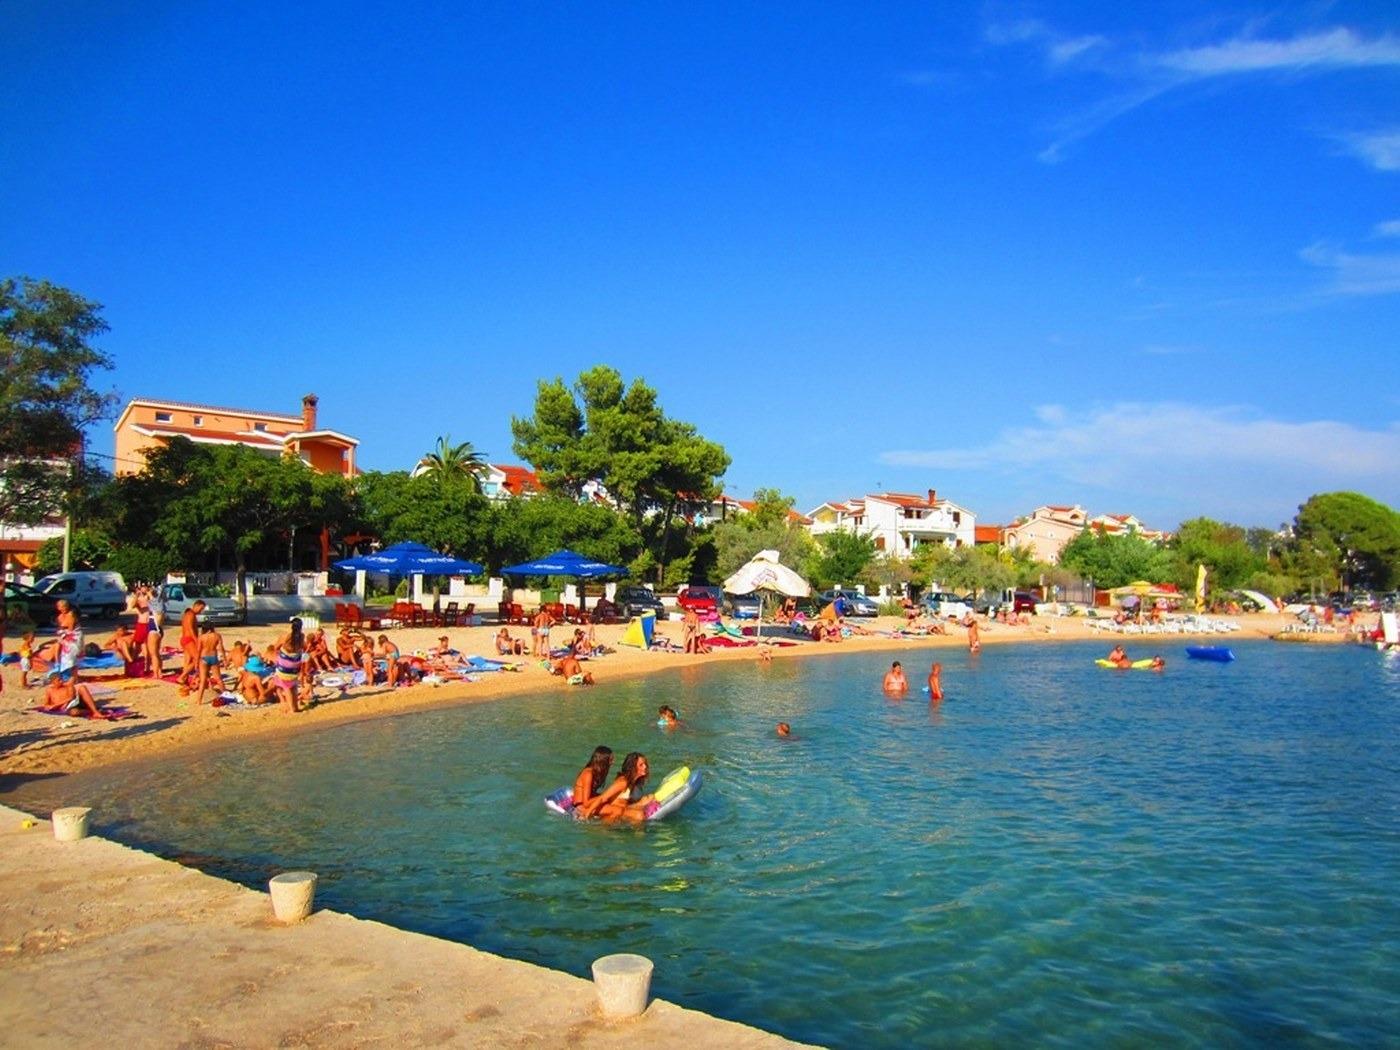 Ferienwohnung Ivan A2(4+1) - Turanj (918634), Turanj, , Dalmatien, Kroatien, Bild 8